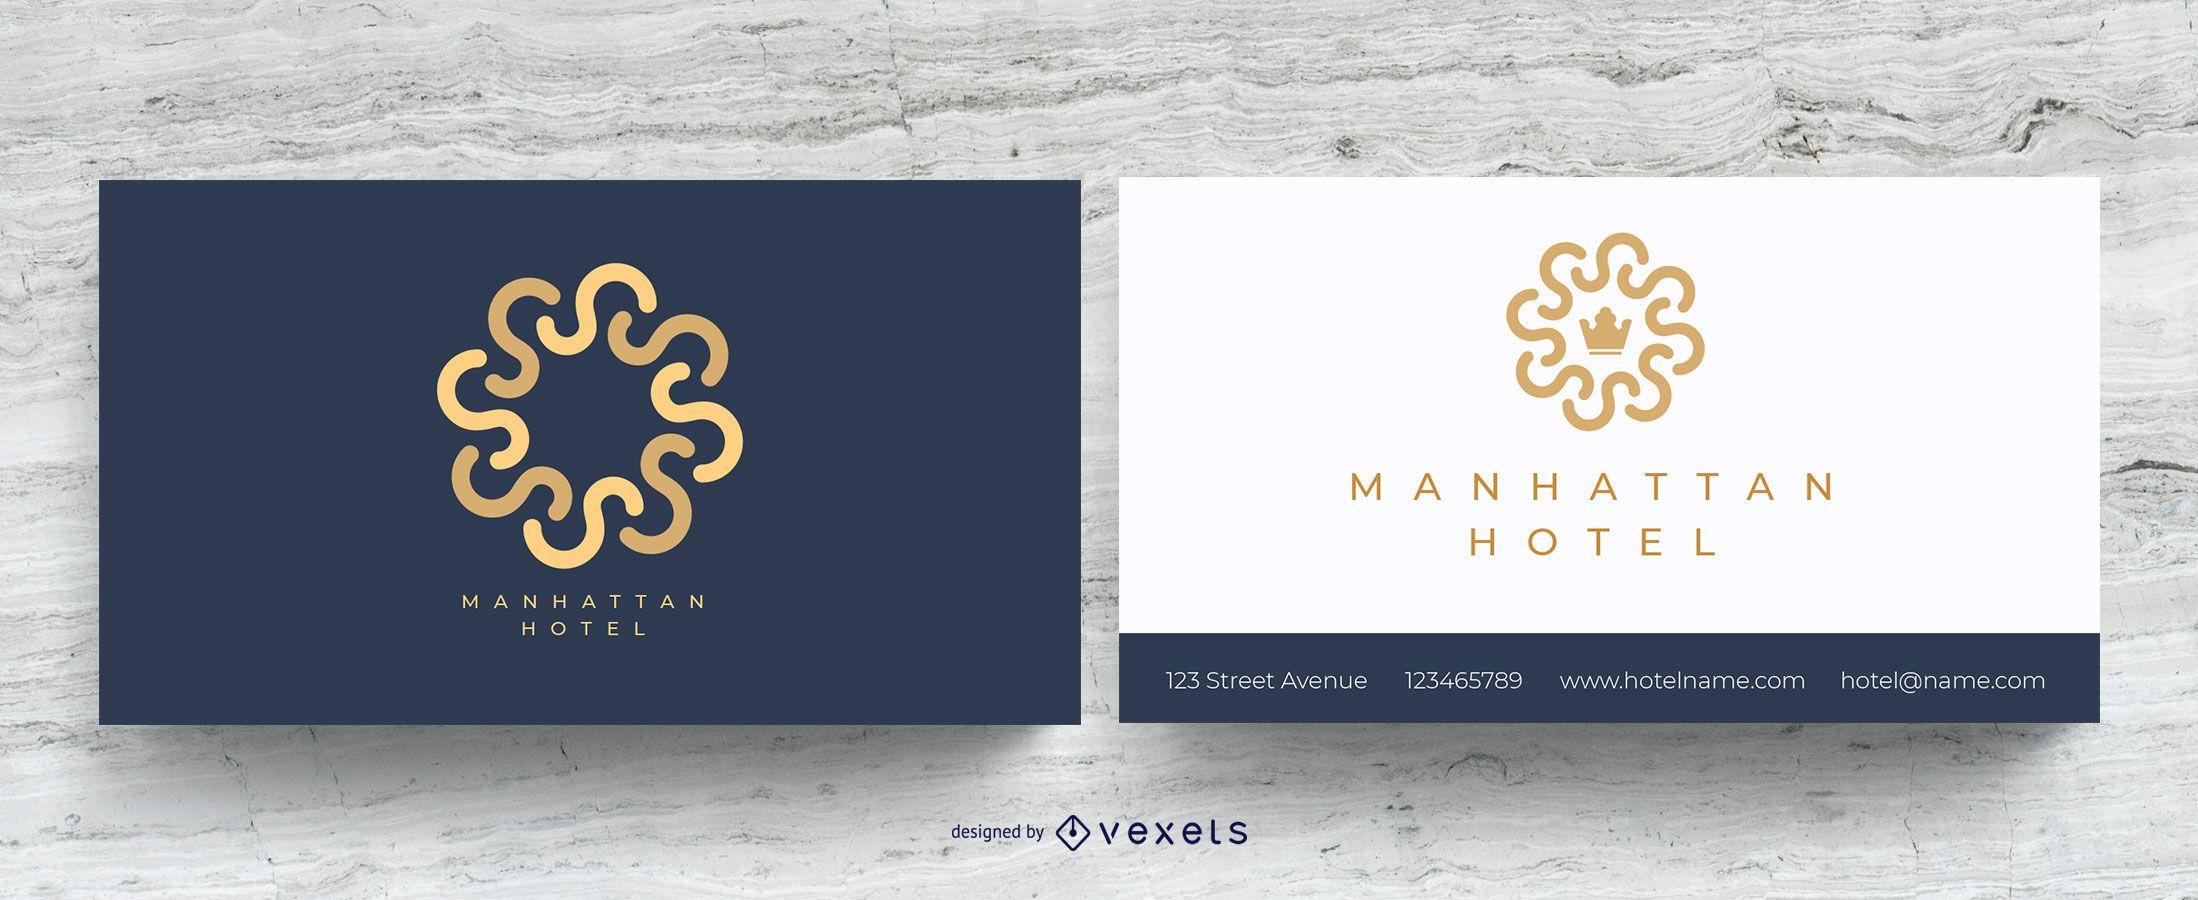 Elegant hotel business card